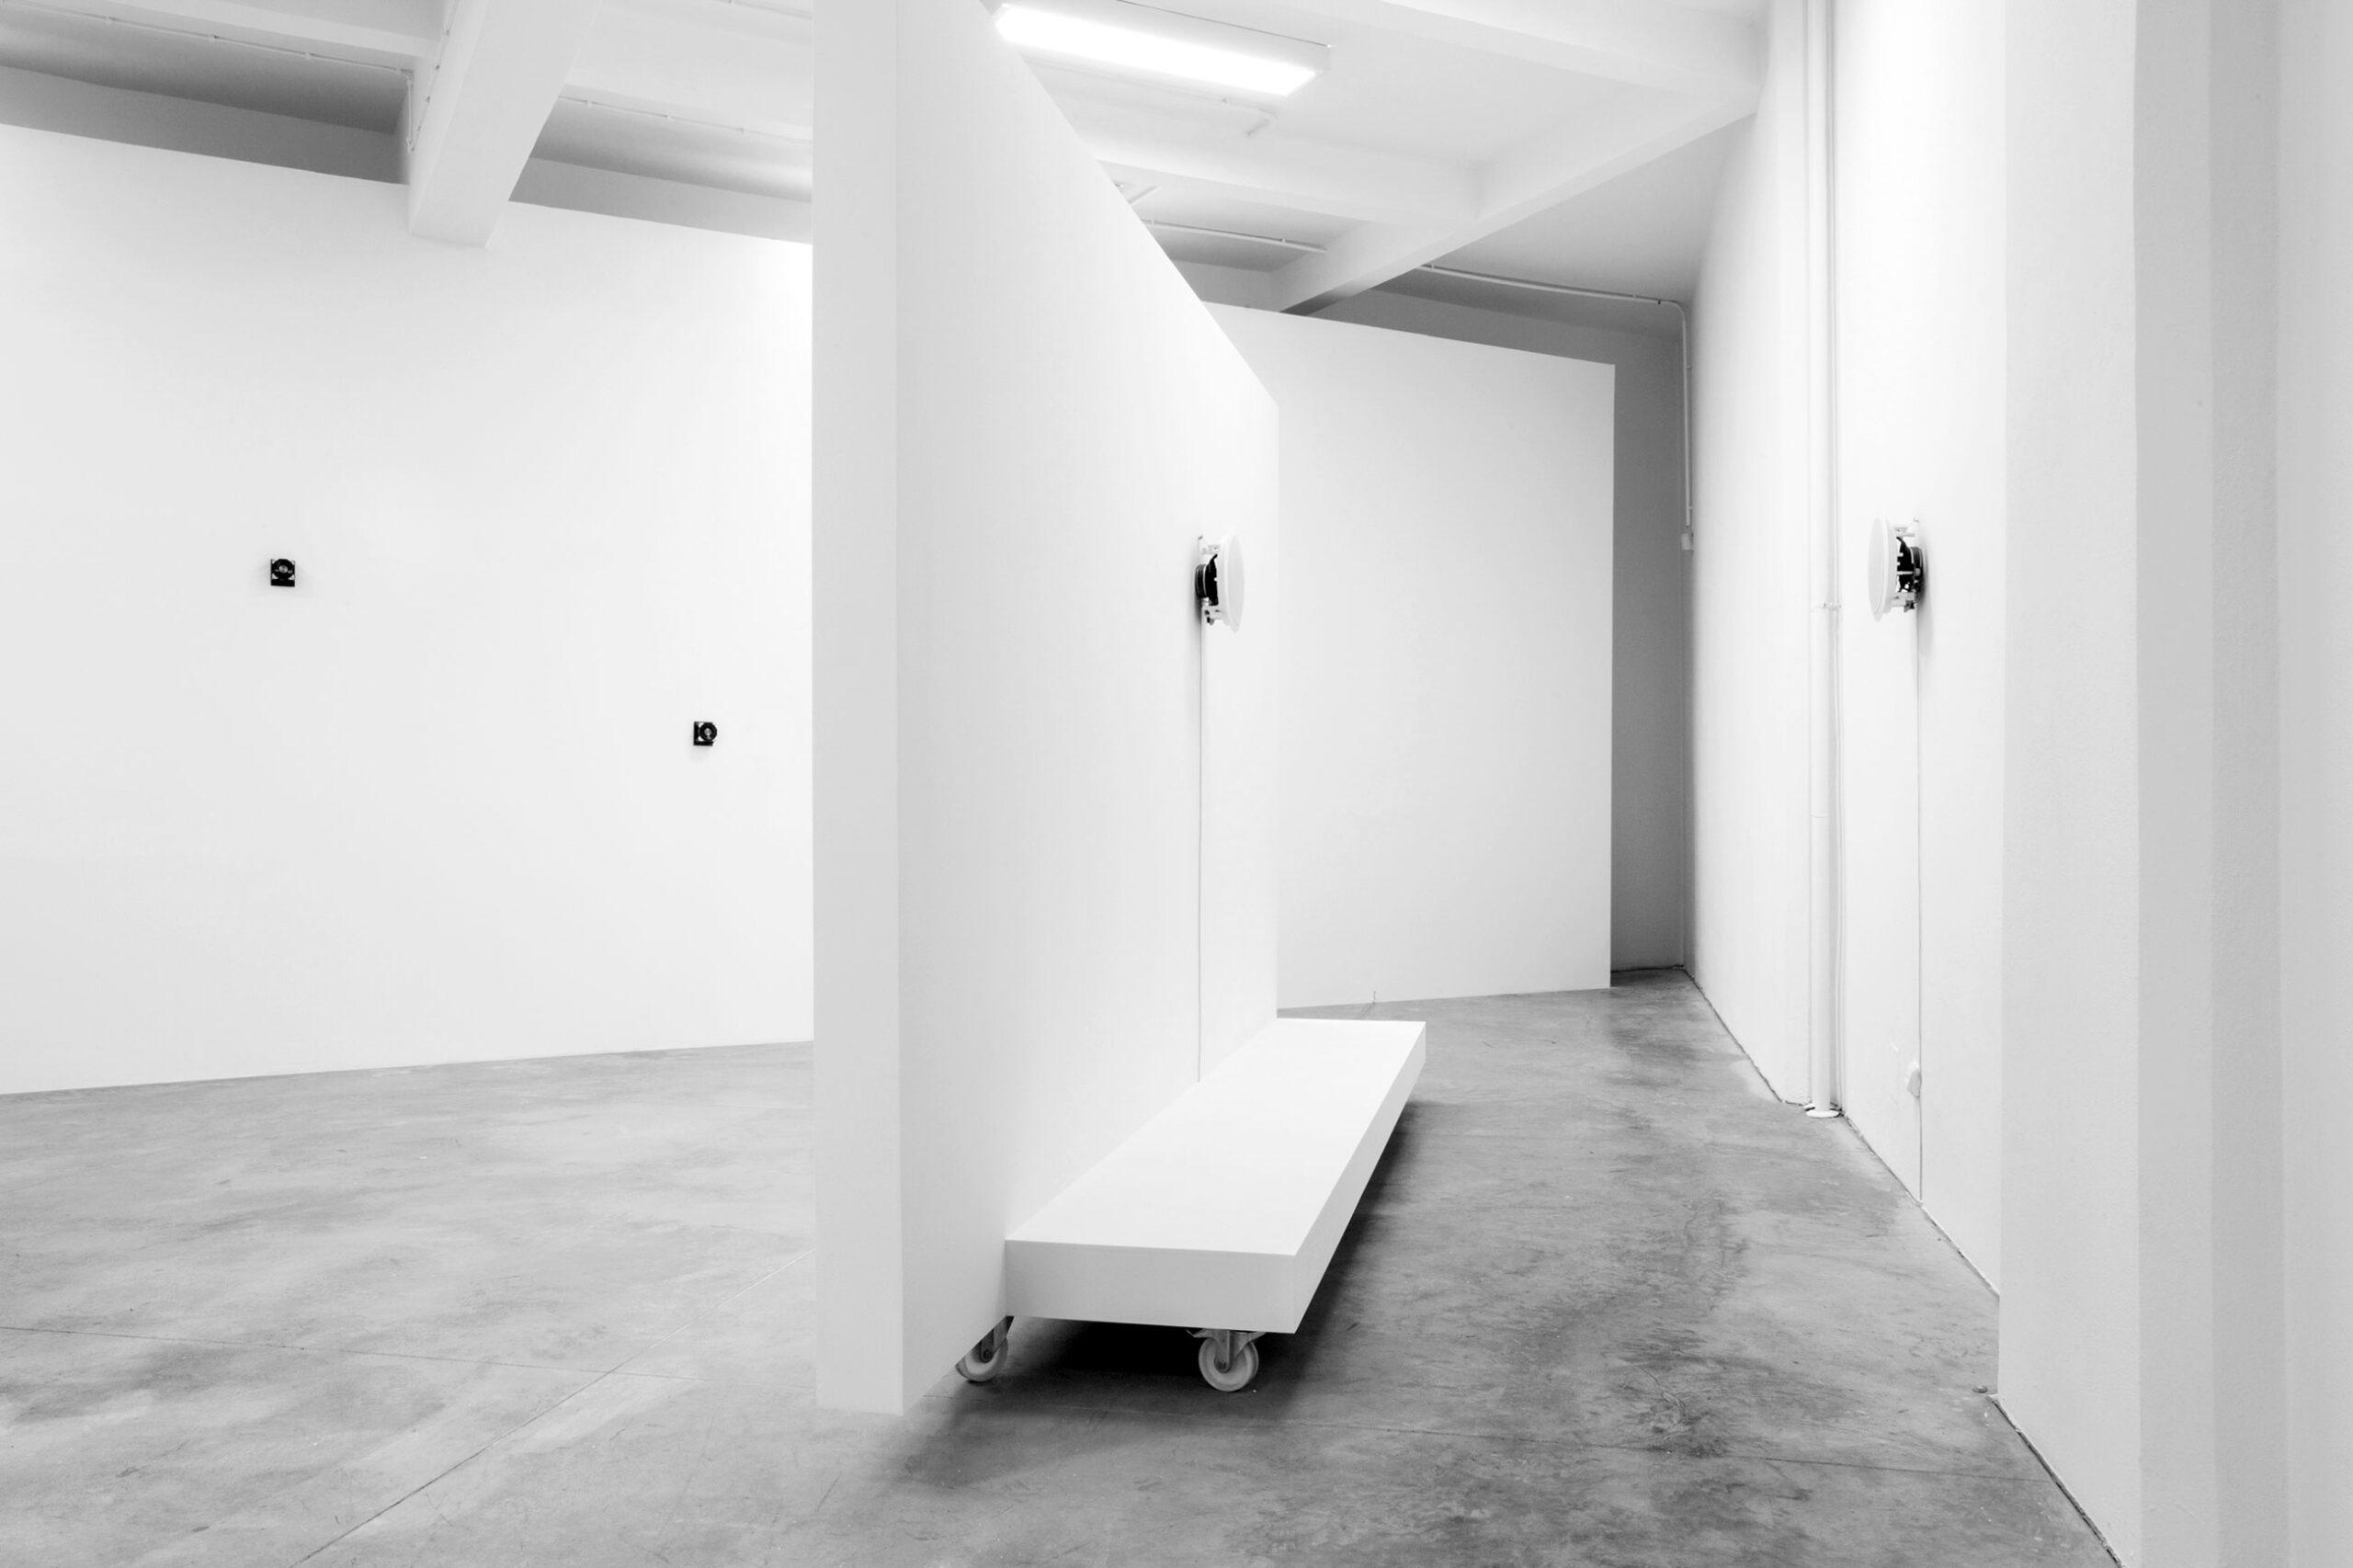 Jacek Doroszenko - Aberration maker, exhibition view 1